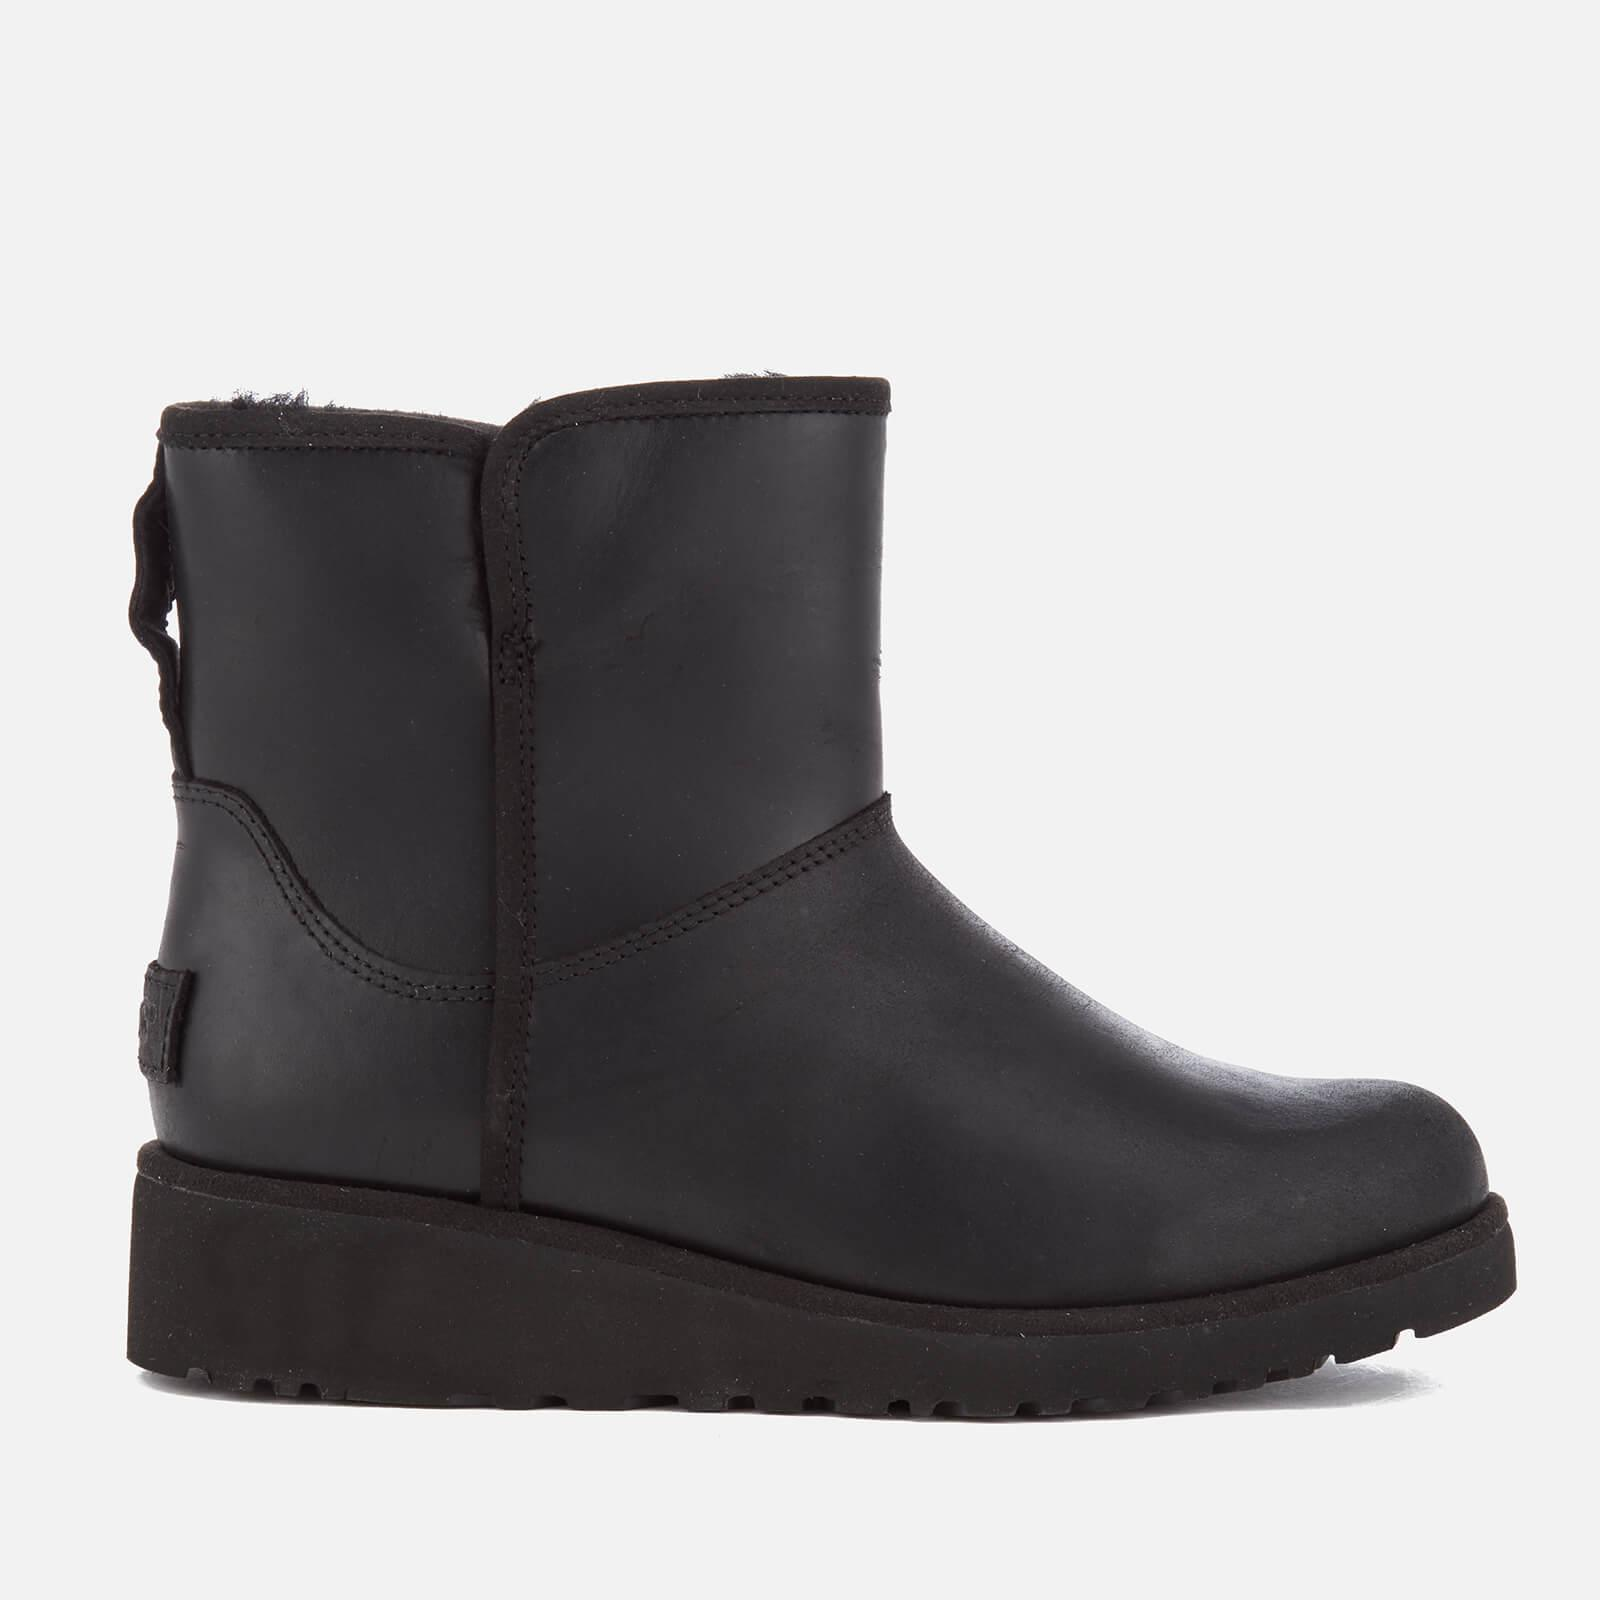 06690dca4c9b UGG Women s Kristin Classic Slim Leather Sheepskin Boots in Black - Lyst